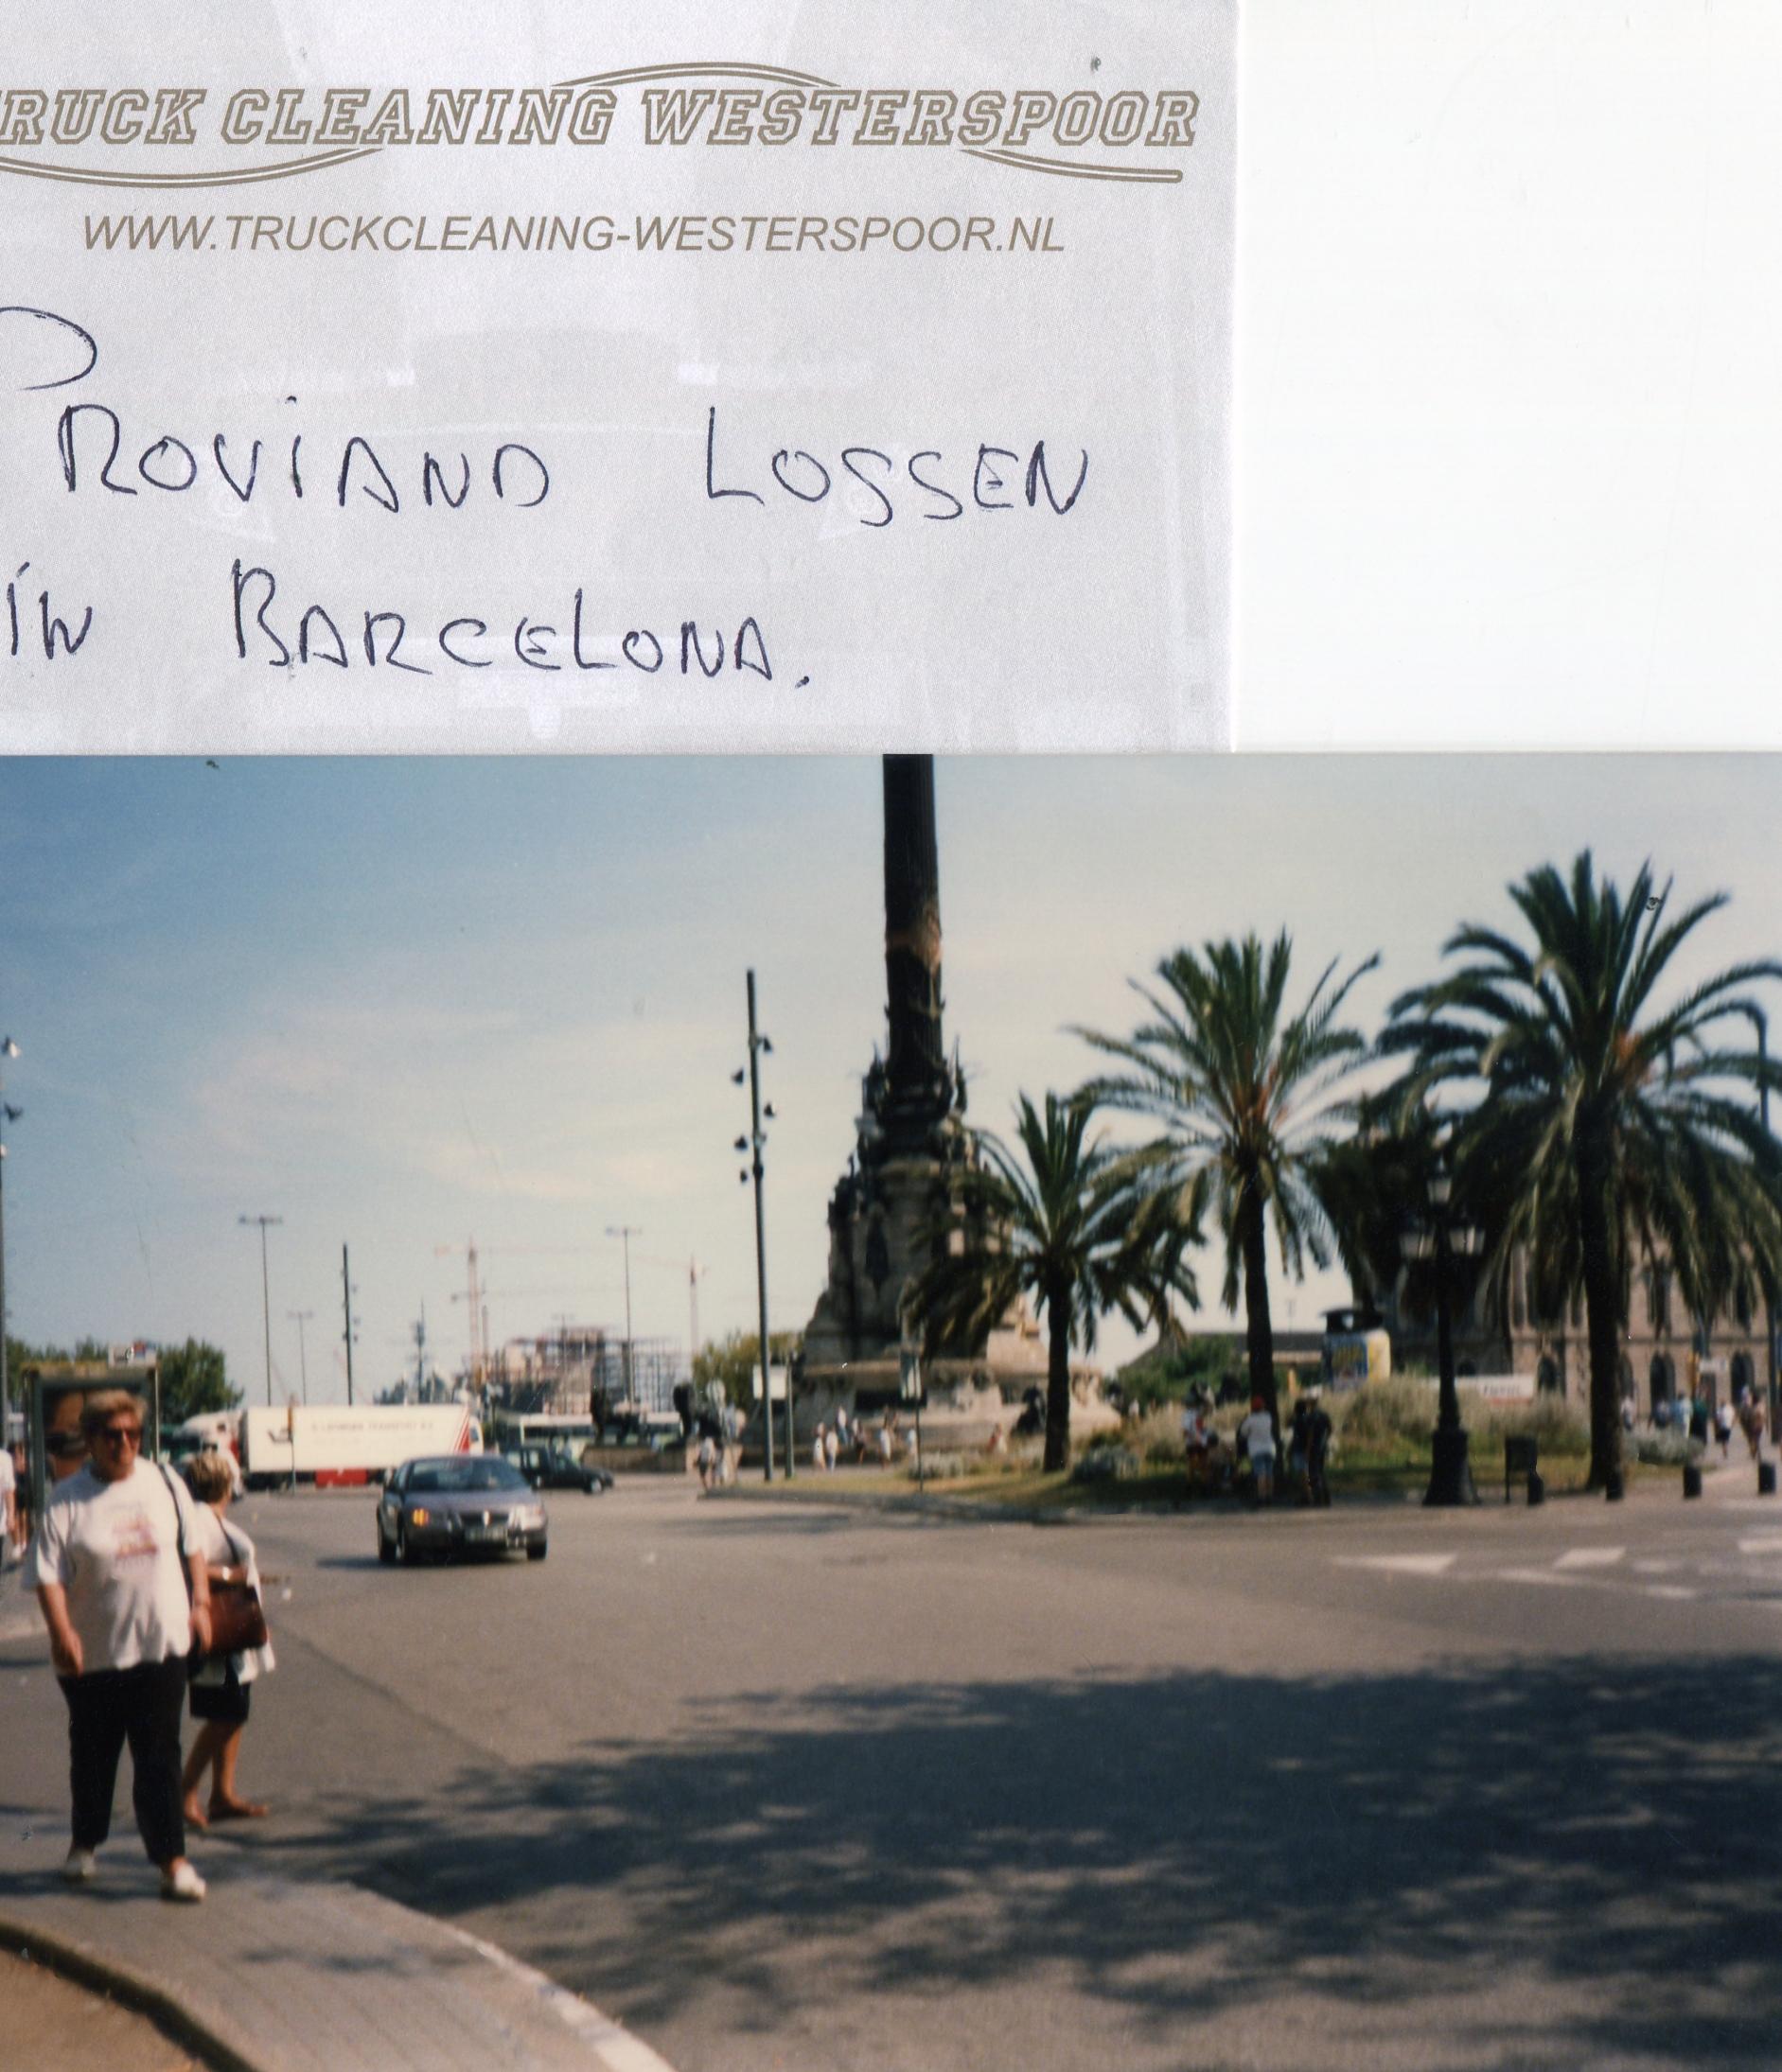 C-proviant-lossen-Barcelona-1